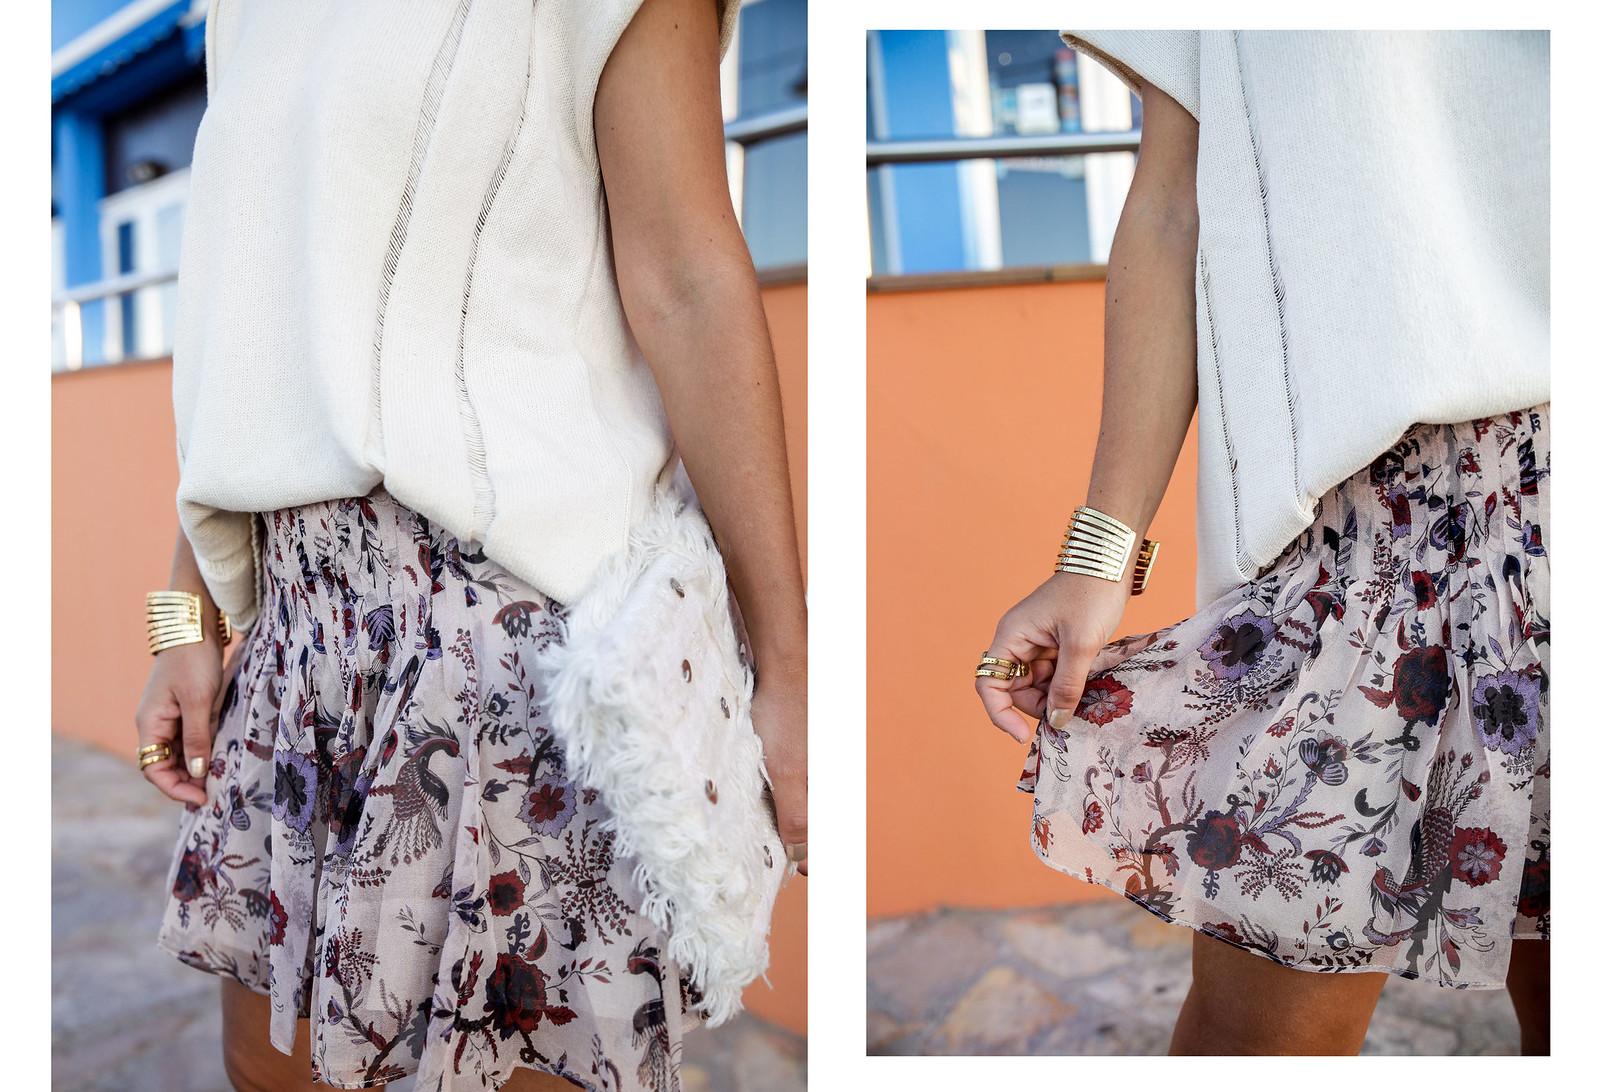 08_blusa_punto_falda_flores_summer_outfit_theguestgirl_rüga_schade_jewels_steve_madden_.magali_pasacal_influencer_barcelona_blogger